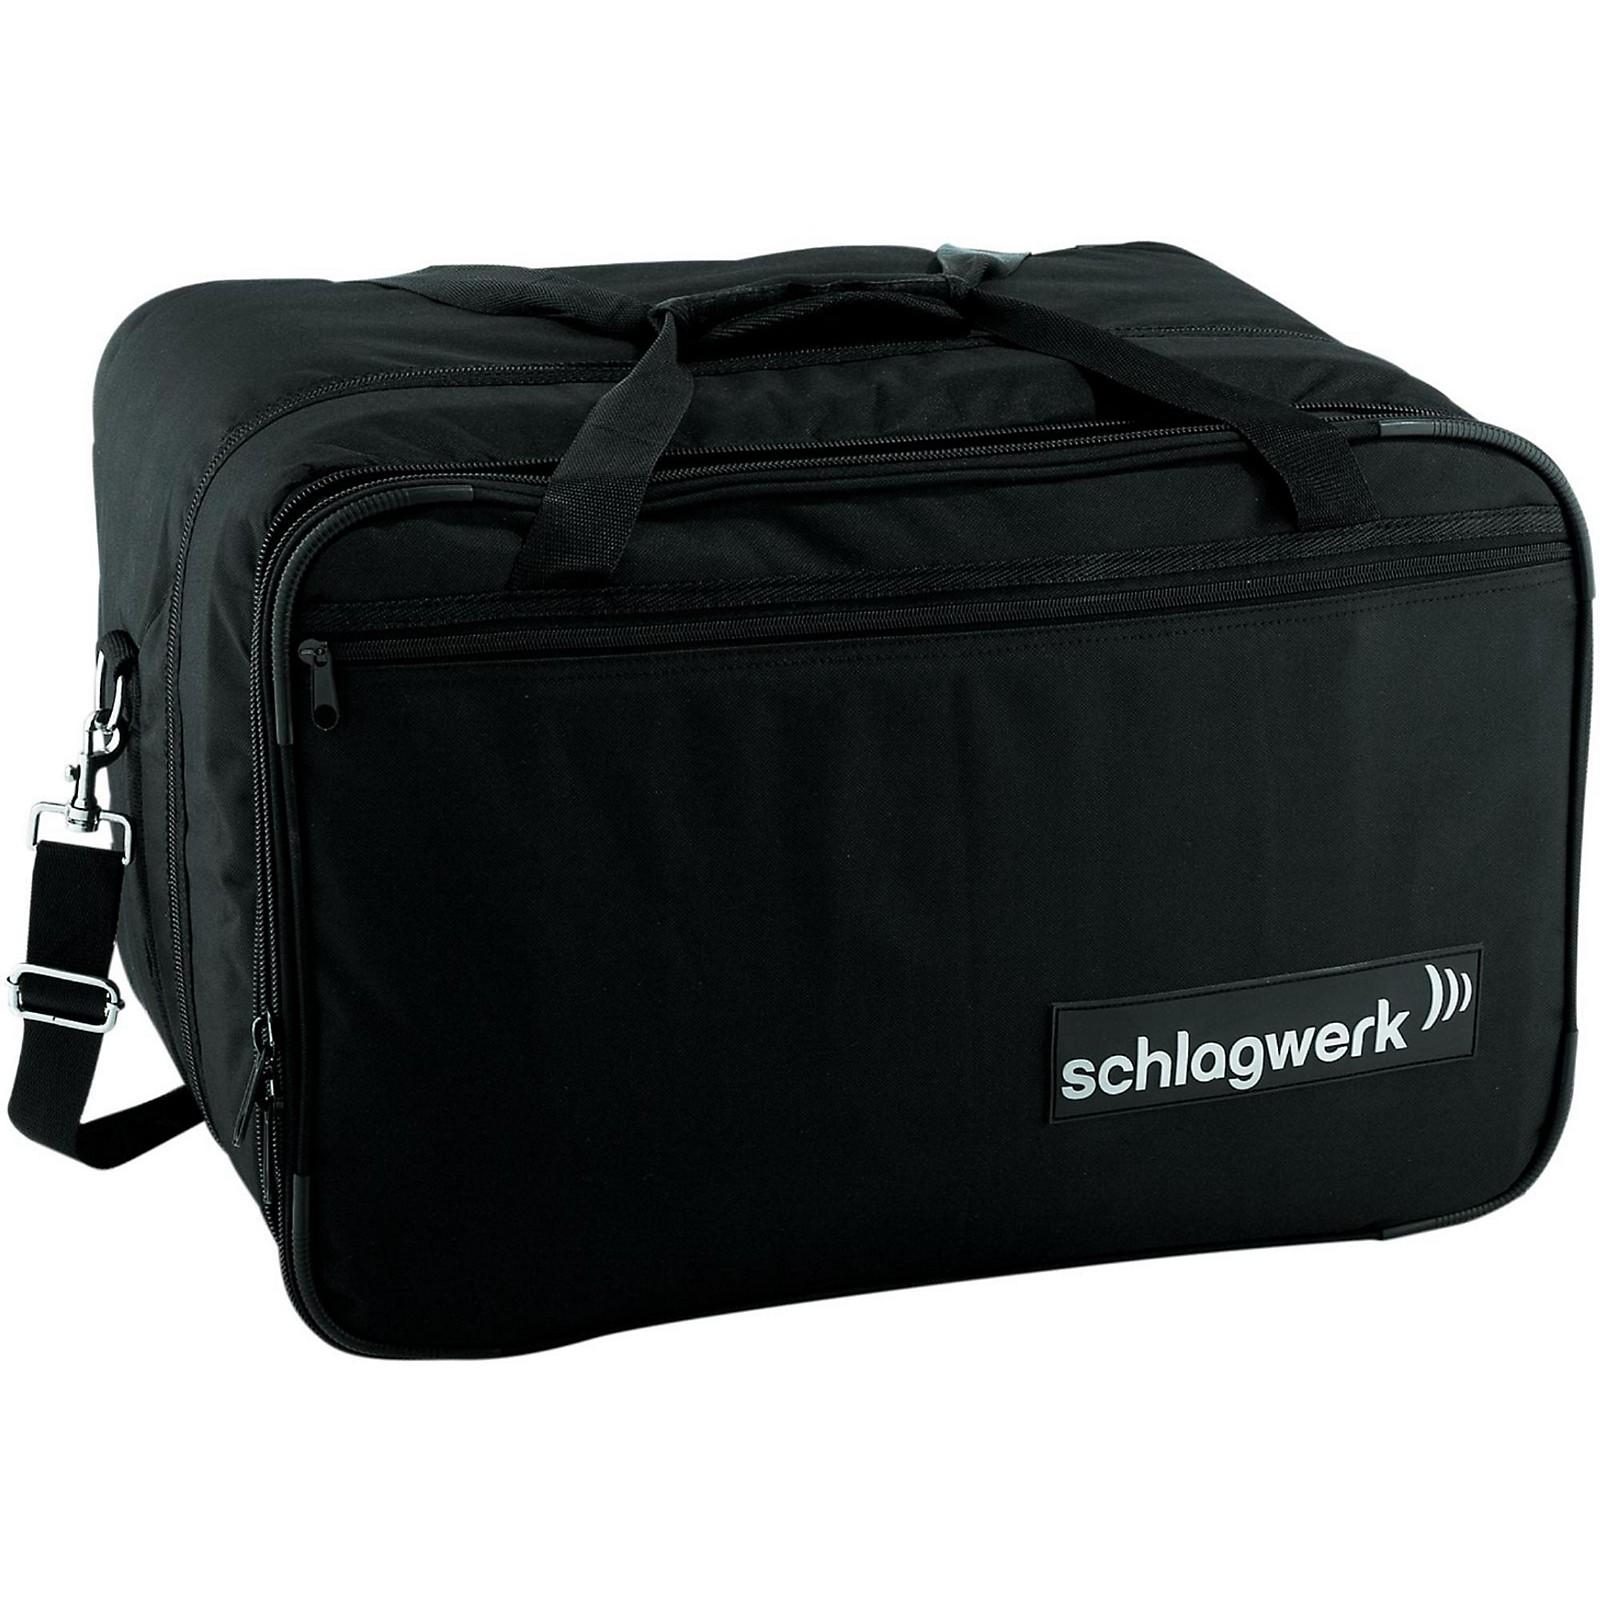 SCHLAGWERK Cajon Carry Case